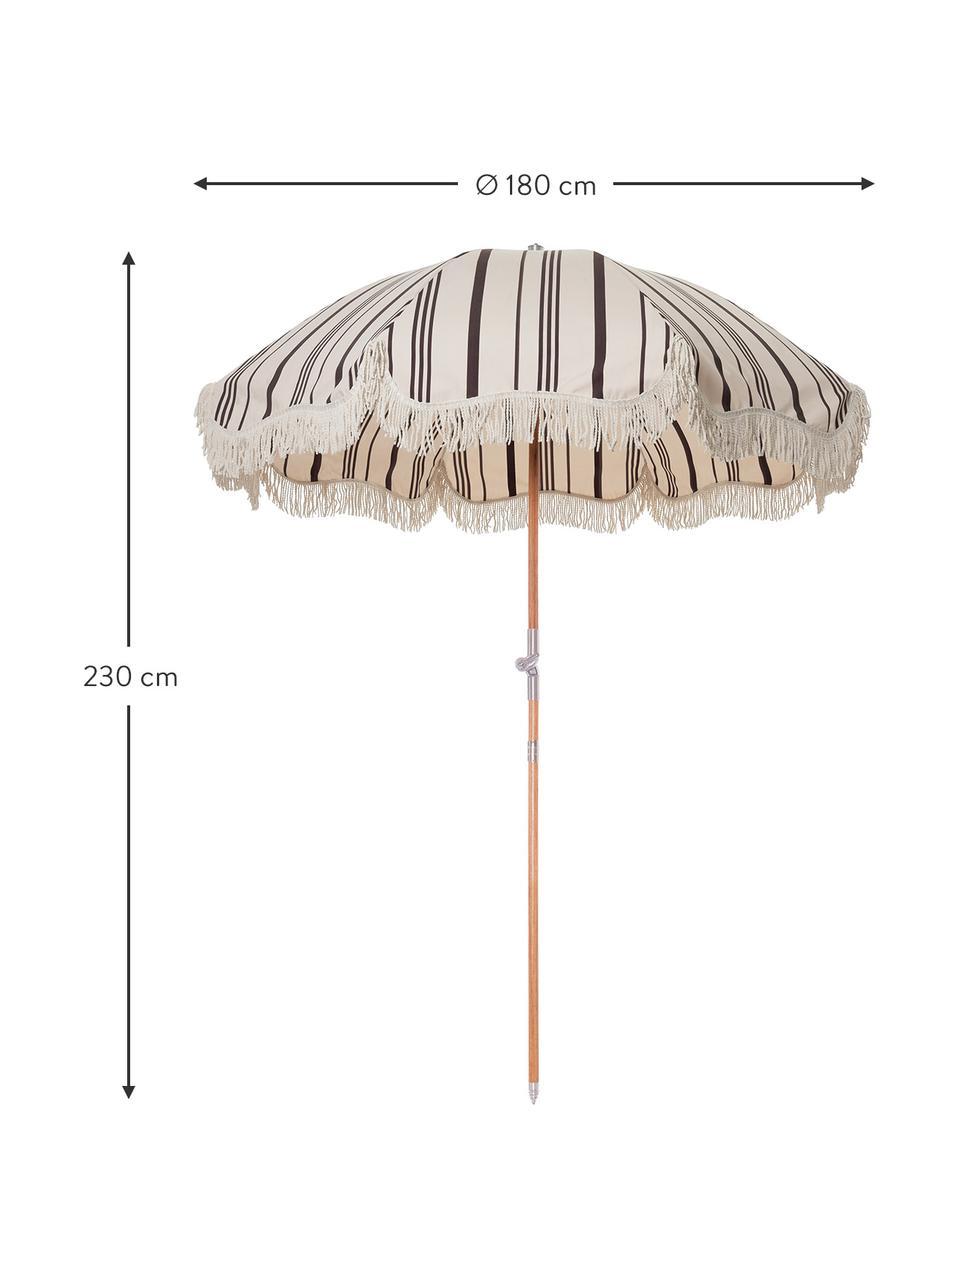 Gestreepte parasol Retro met franjes, knikbaar, Frame: gelamineerd hout, Franjes: katoen, Zwart, gebroken wit, Ø 180 x H 230 cm